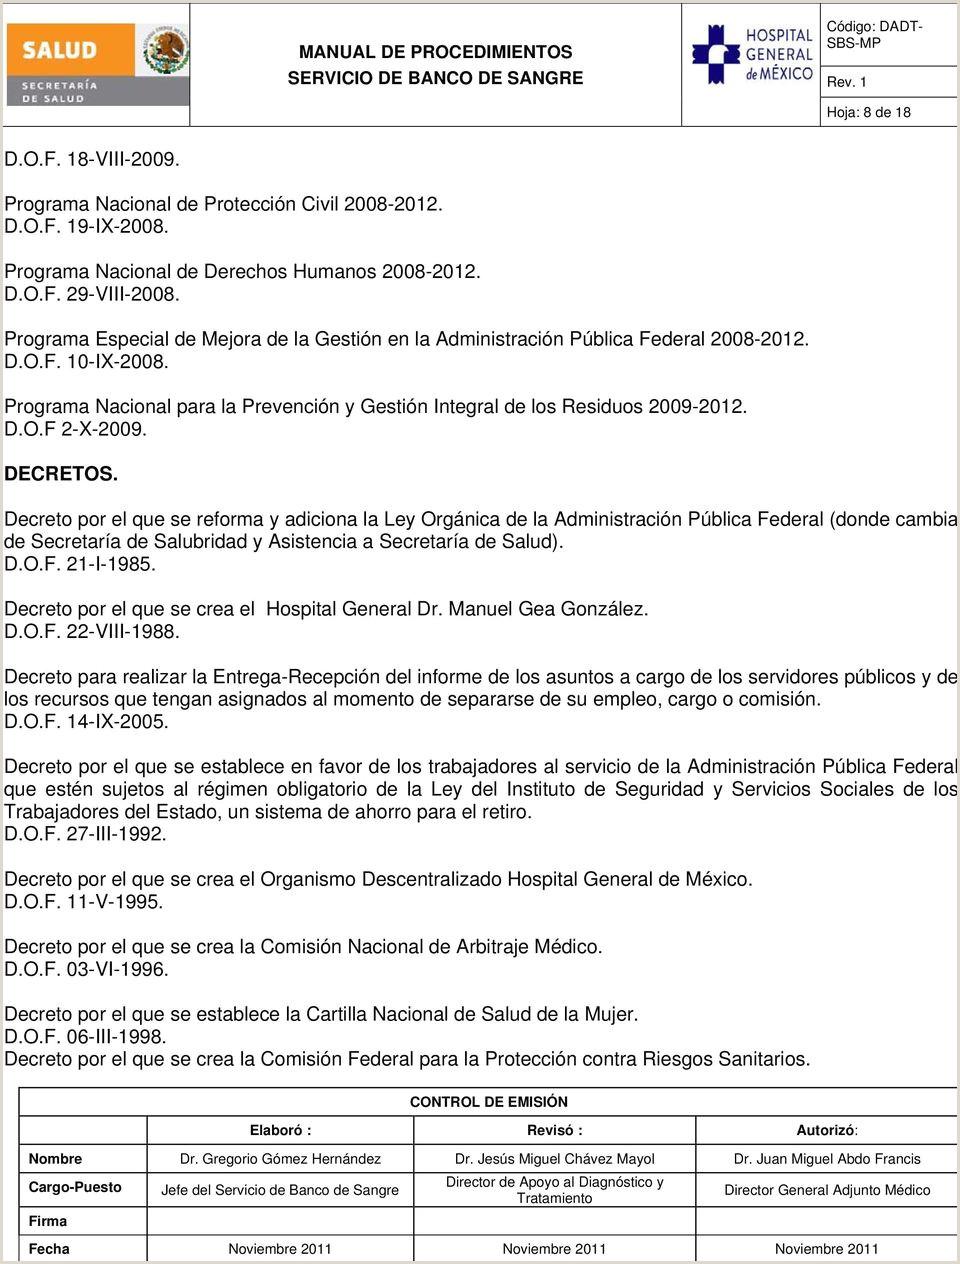 HOSPITAL GENERAL DE MéXICO O D MANUAL DE PROCEDIMIENTOS